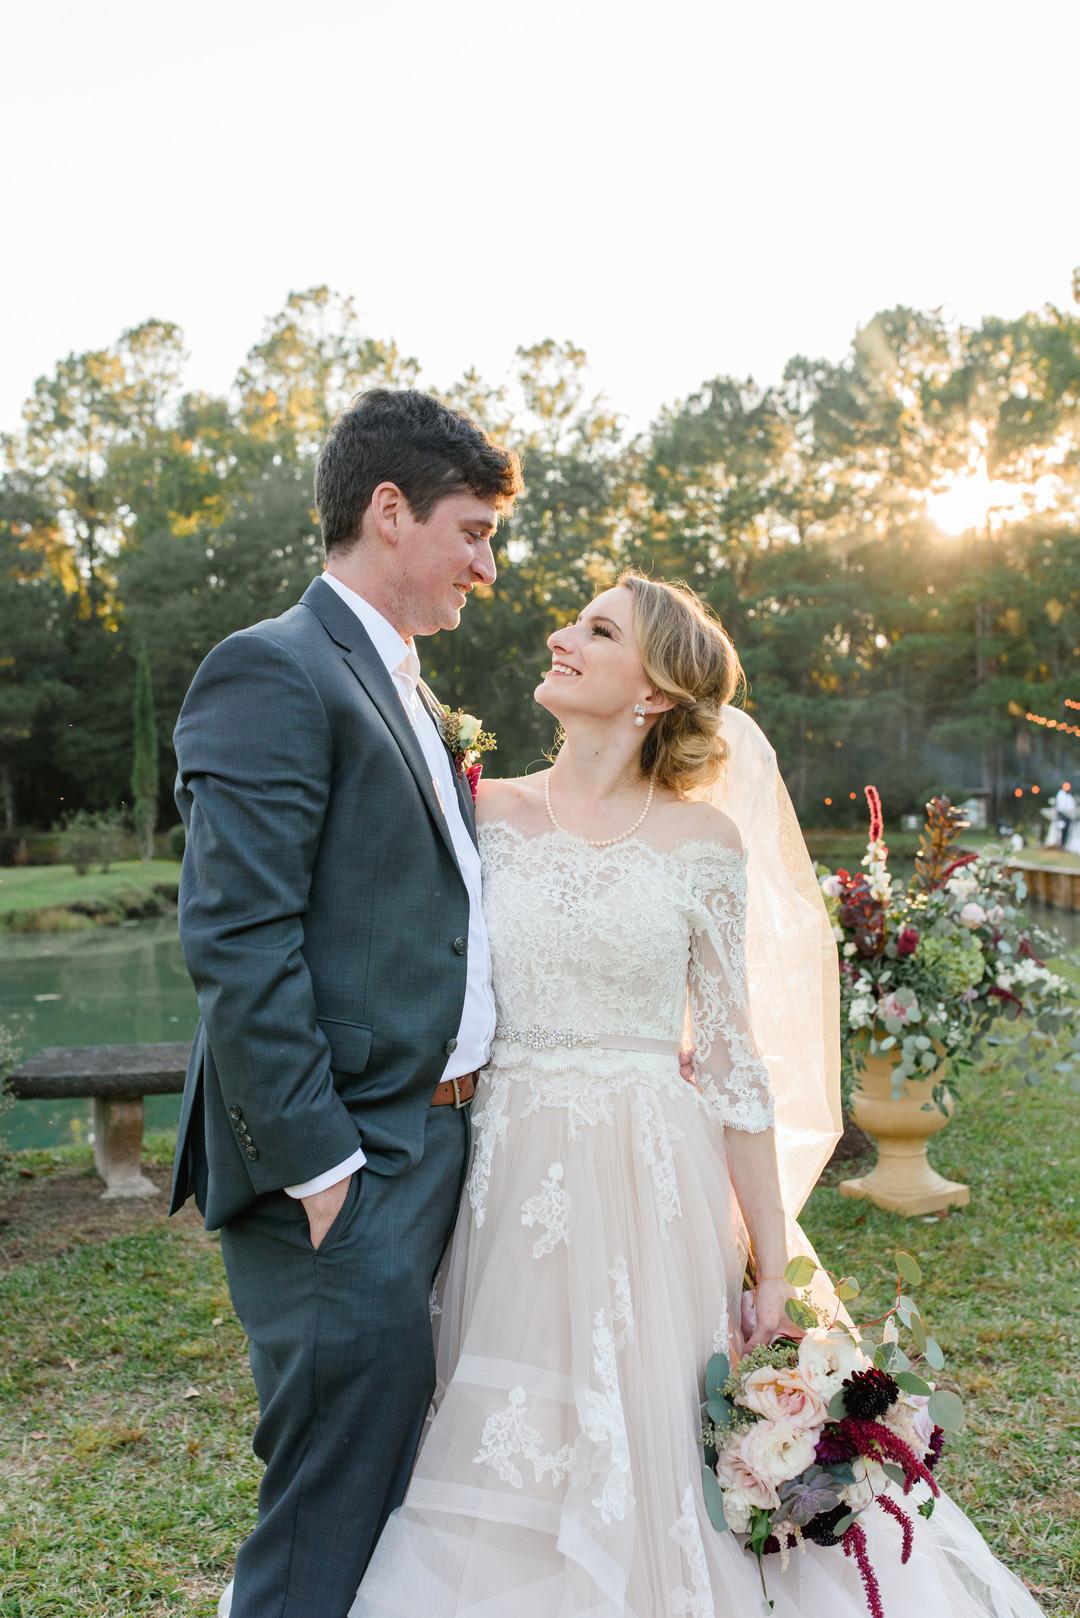 old-wide-awake-plantation-wedding-26.JPG